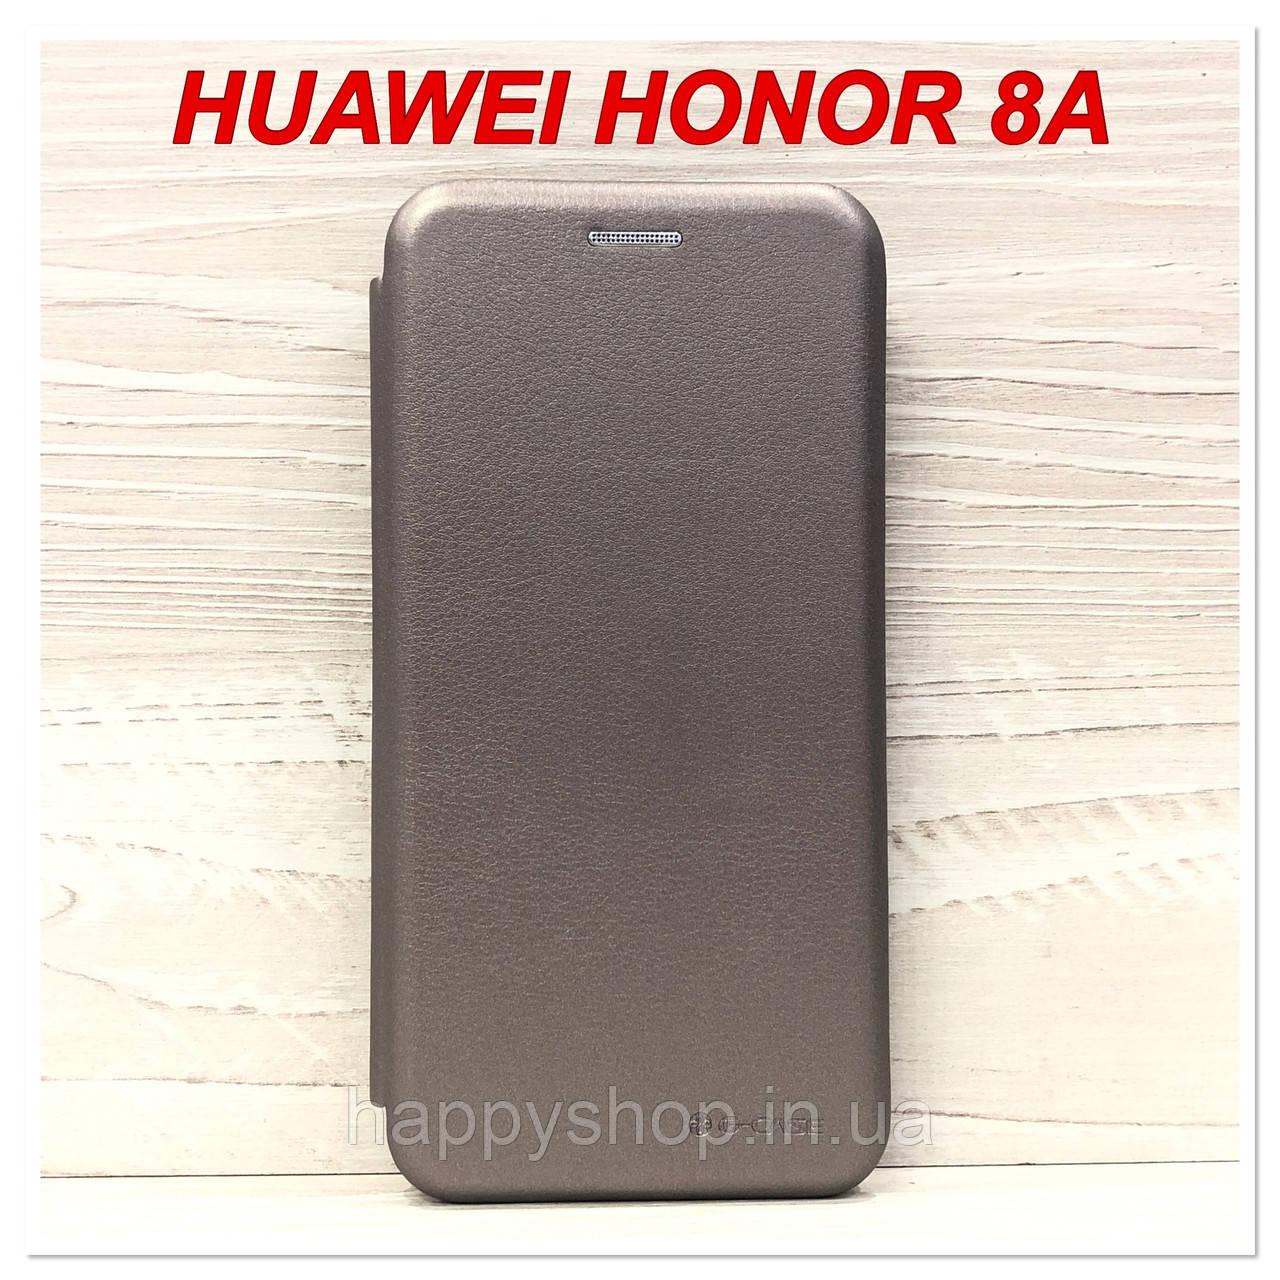 Чохол-книжка G-case для Huawei Honor 8A (Сірий)